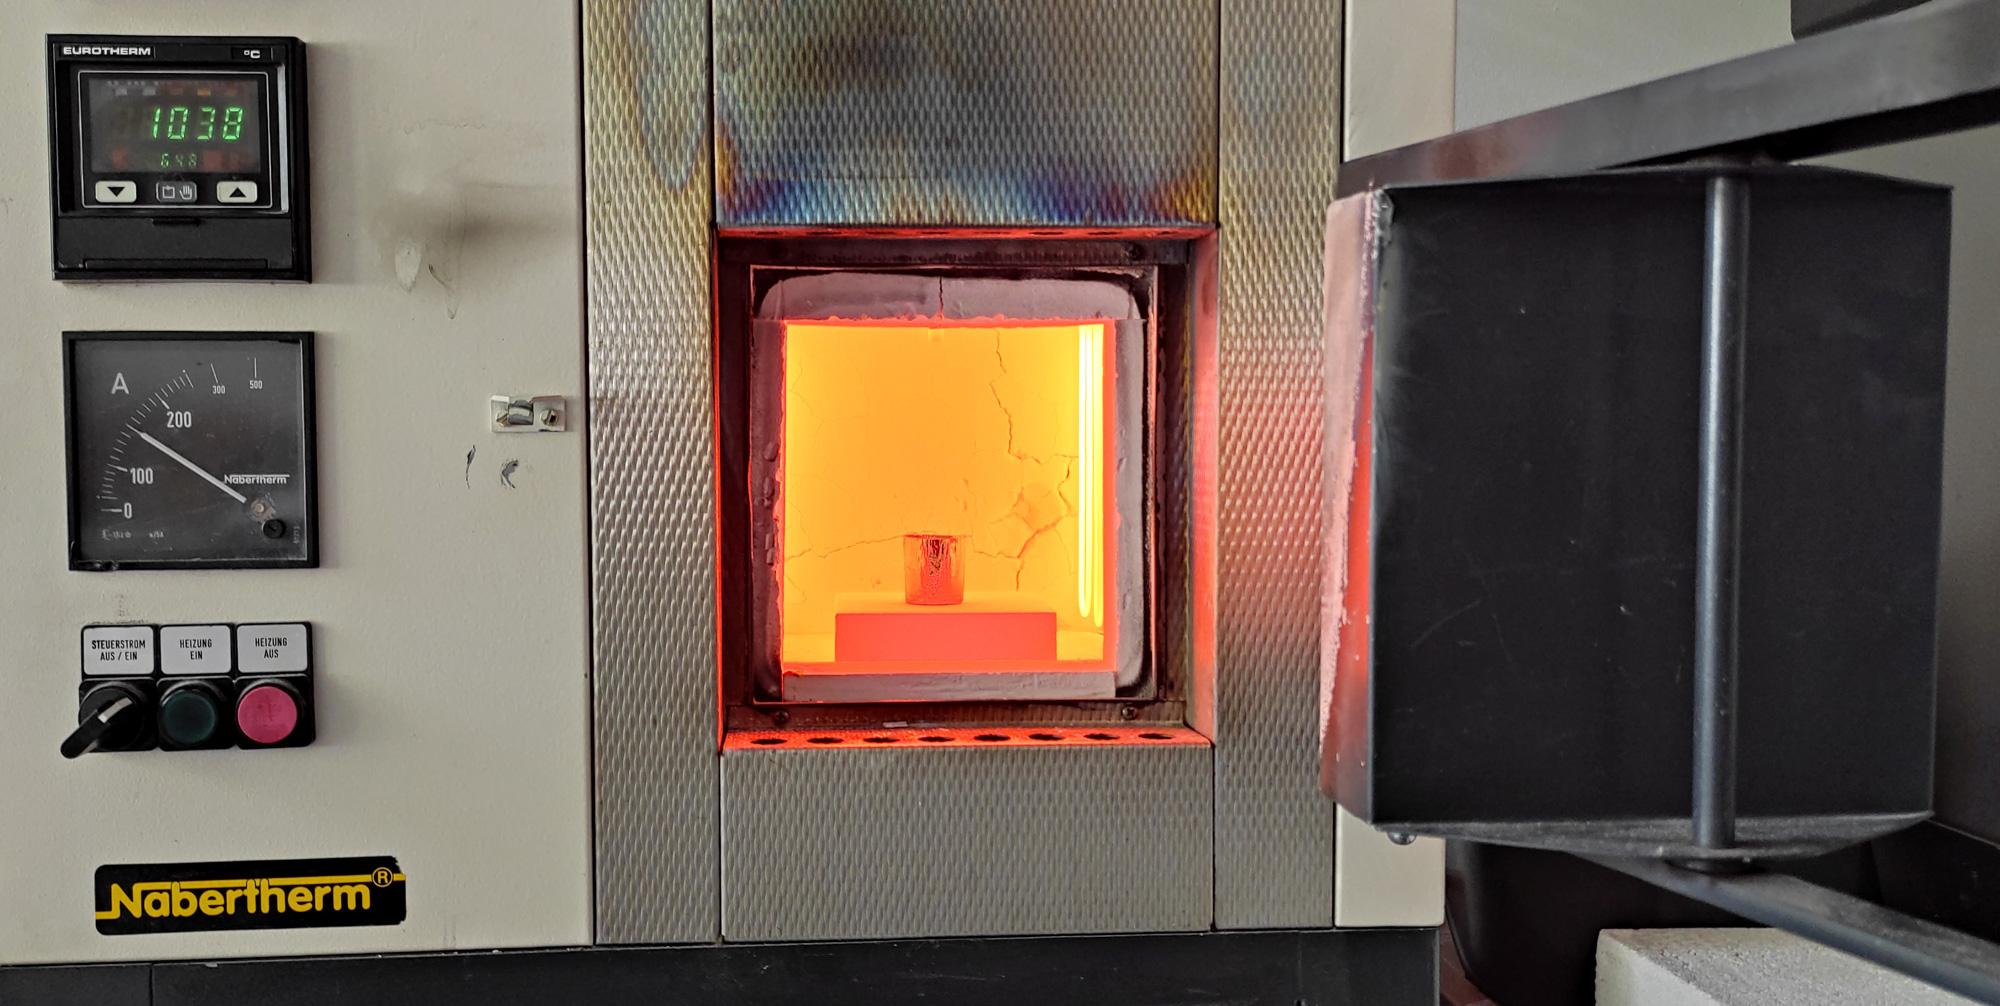 A laboratory oven glowing orange.